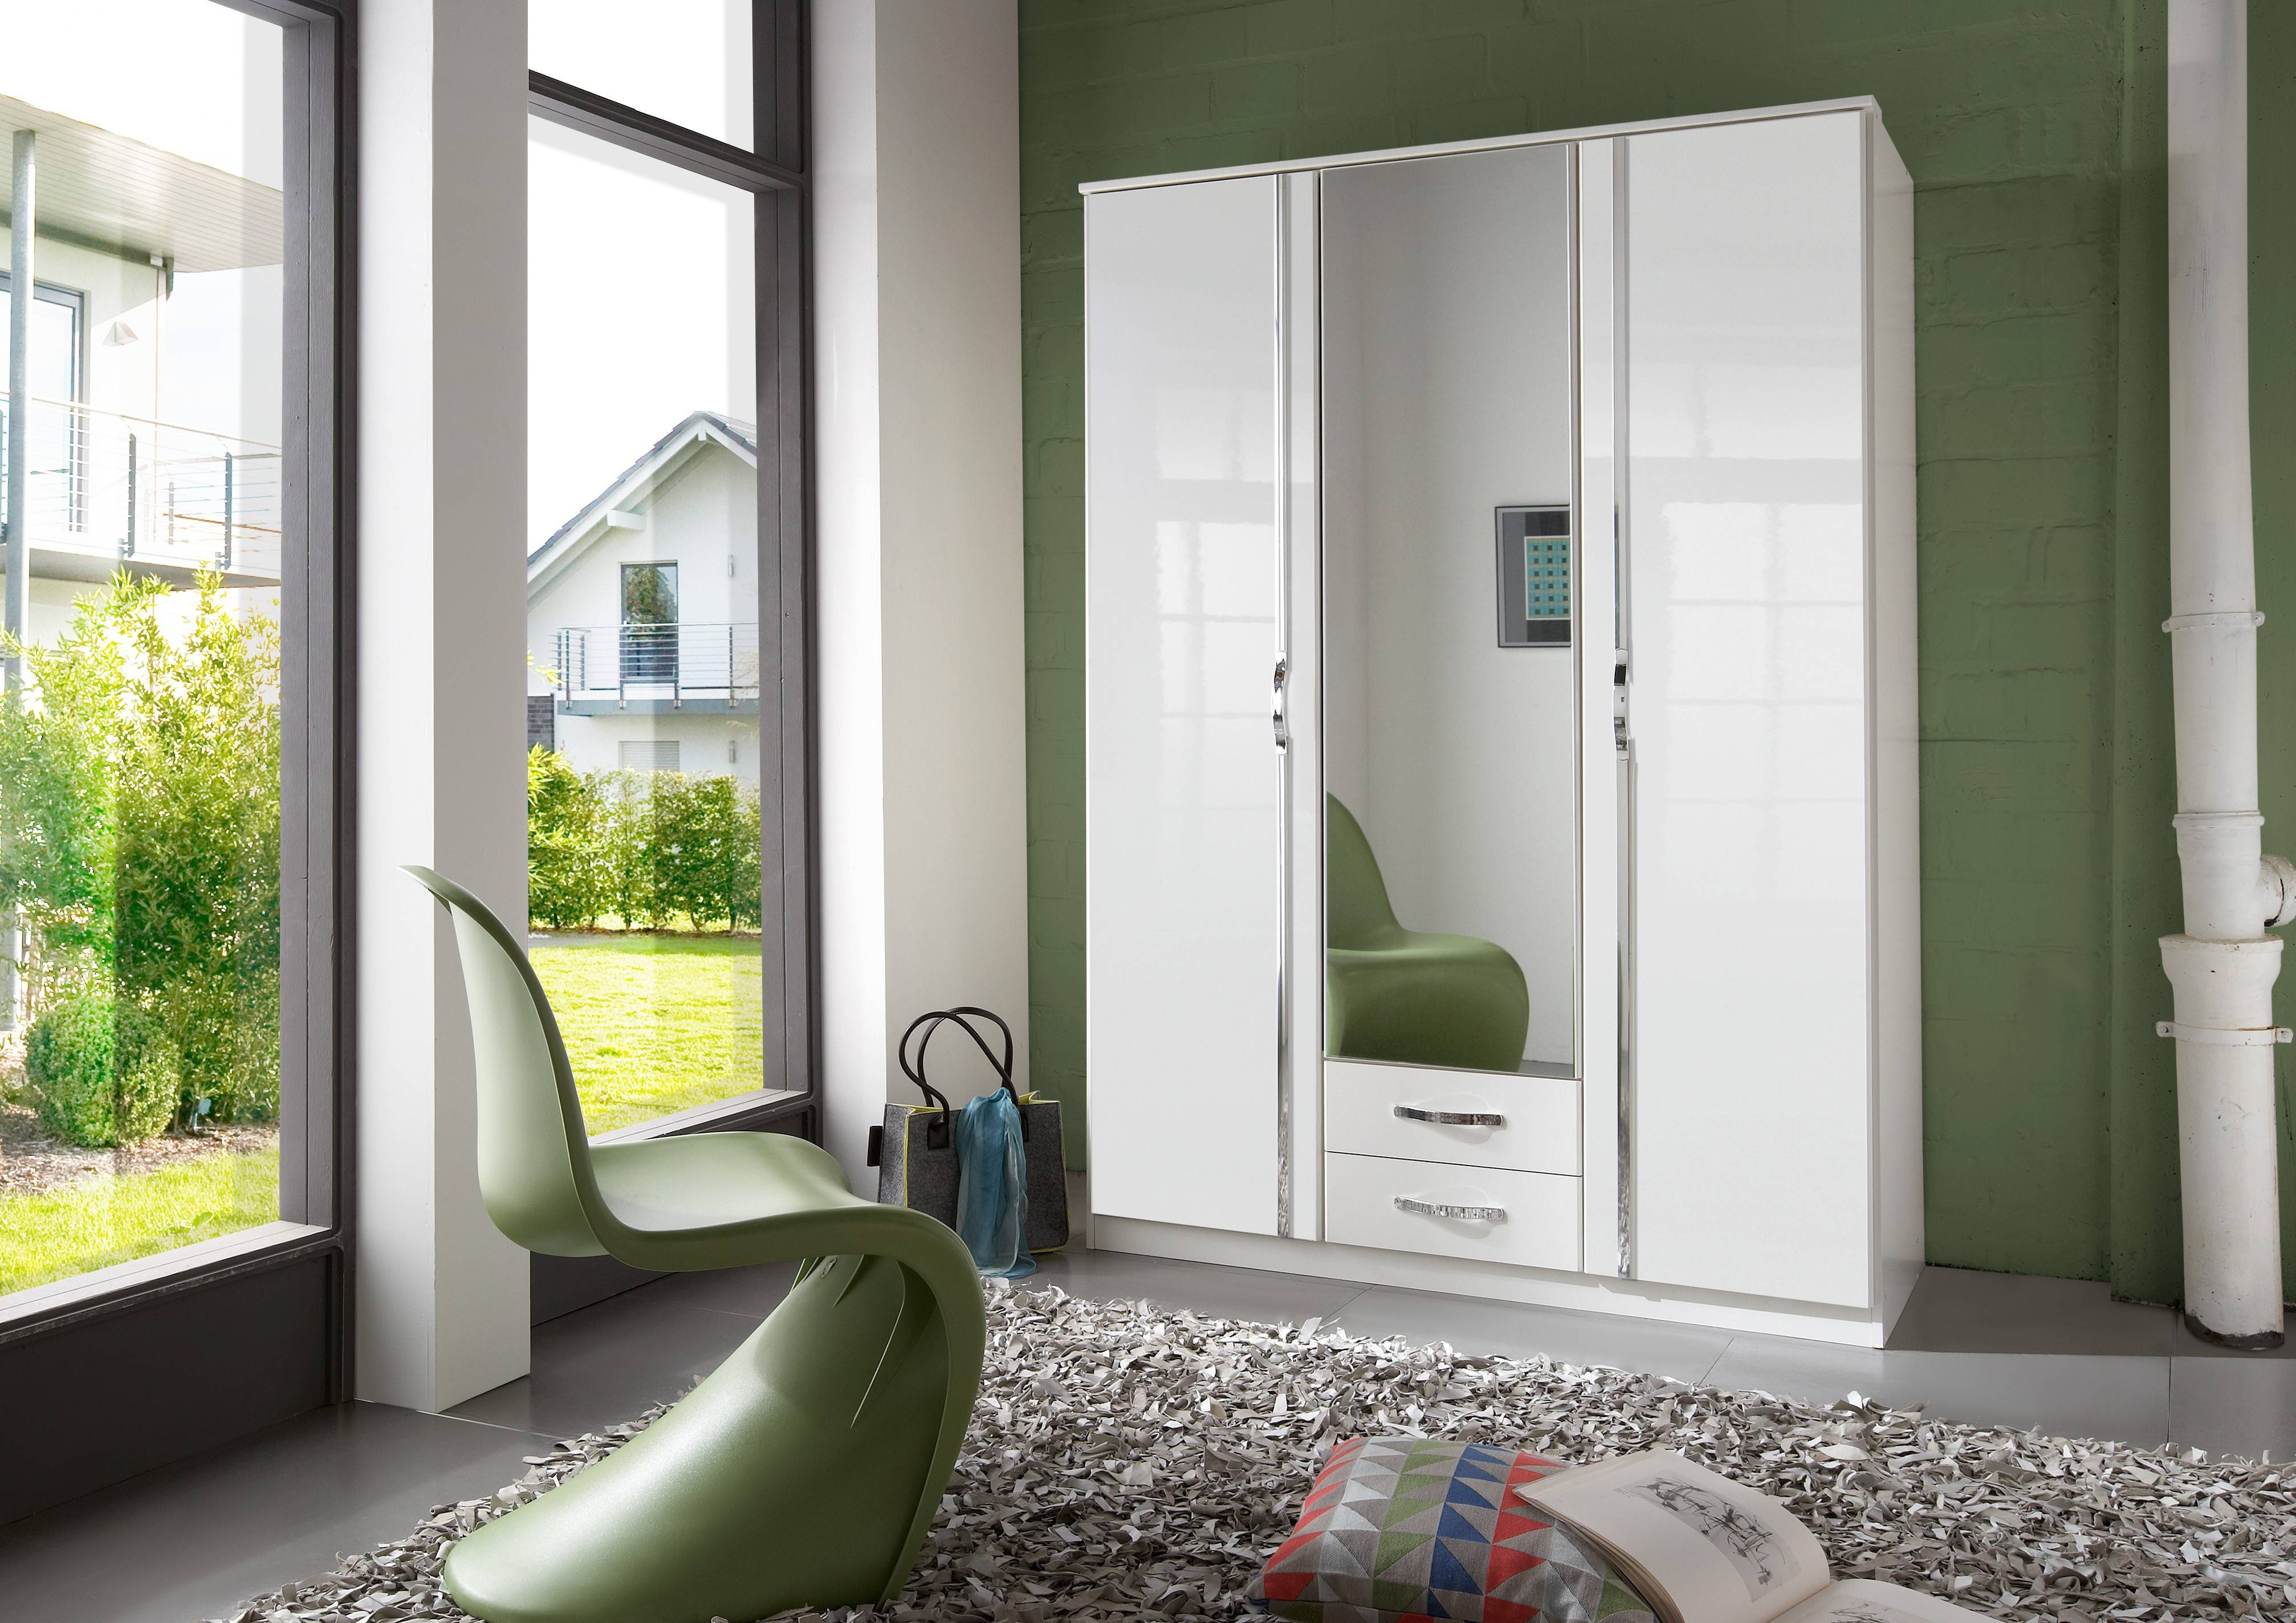 Slumberhaus 'trio' White Gloss, Chrome & Mirror 3 Door 2 Drawer in 3 Door White Wardrobes With Drawers (Image 12 of 15)